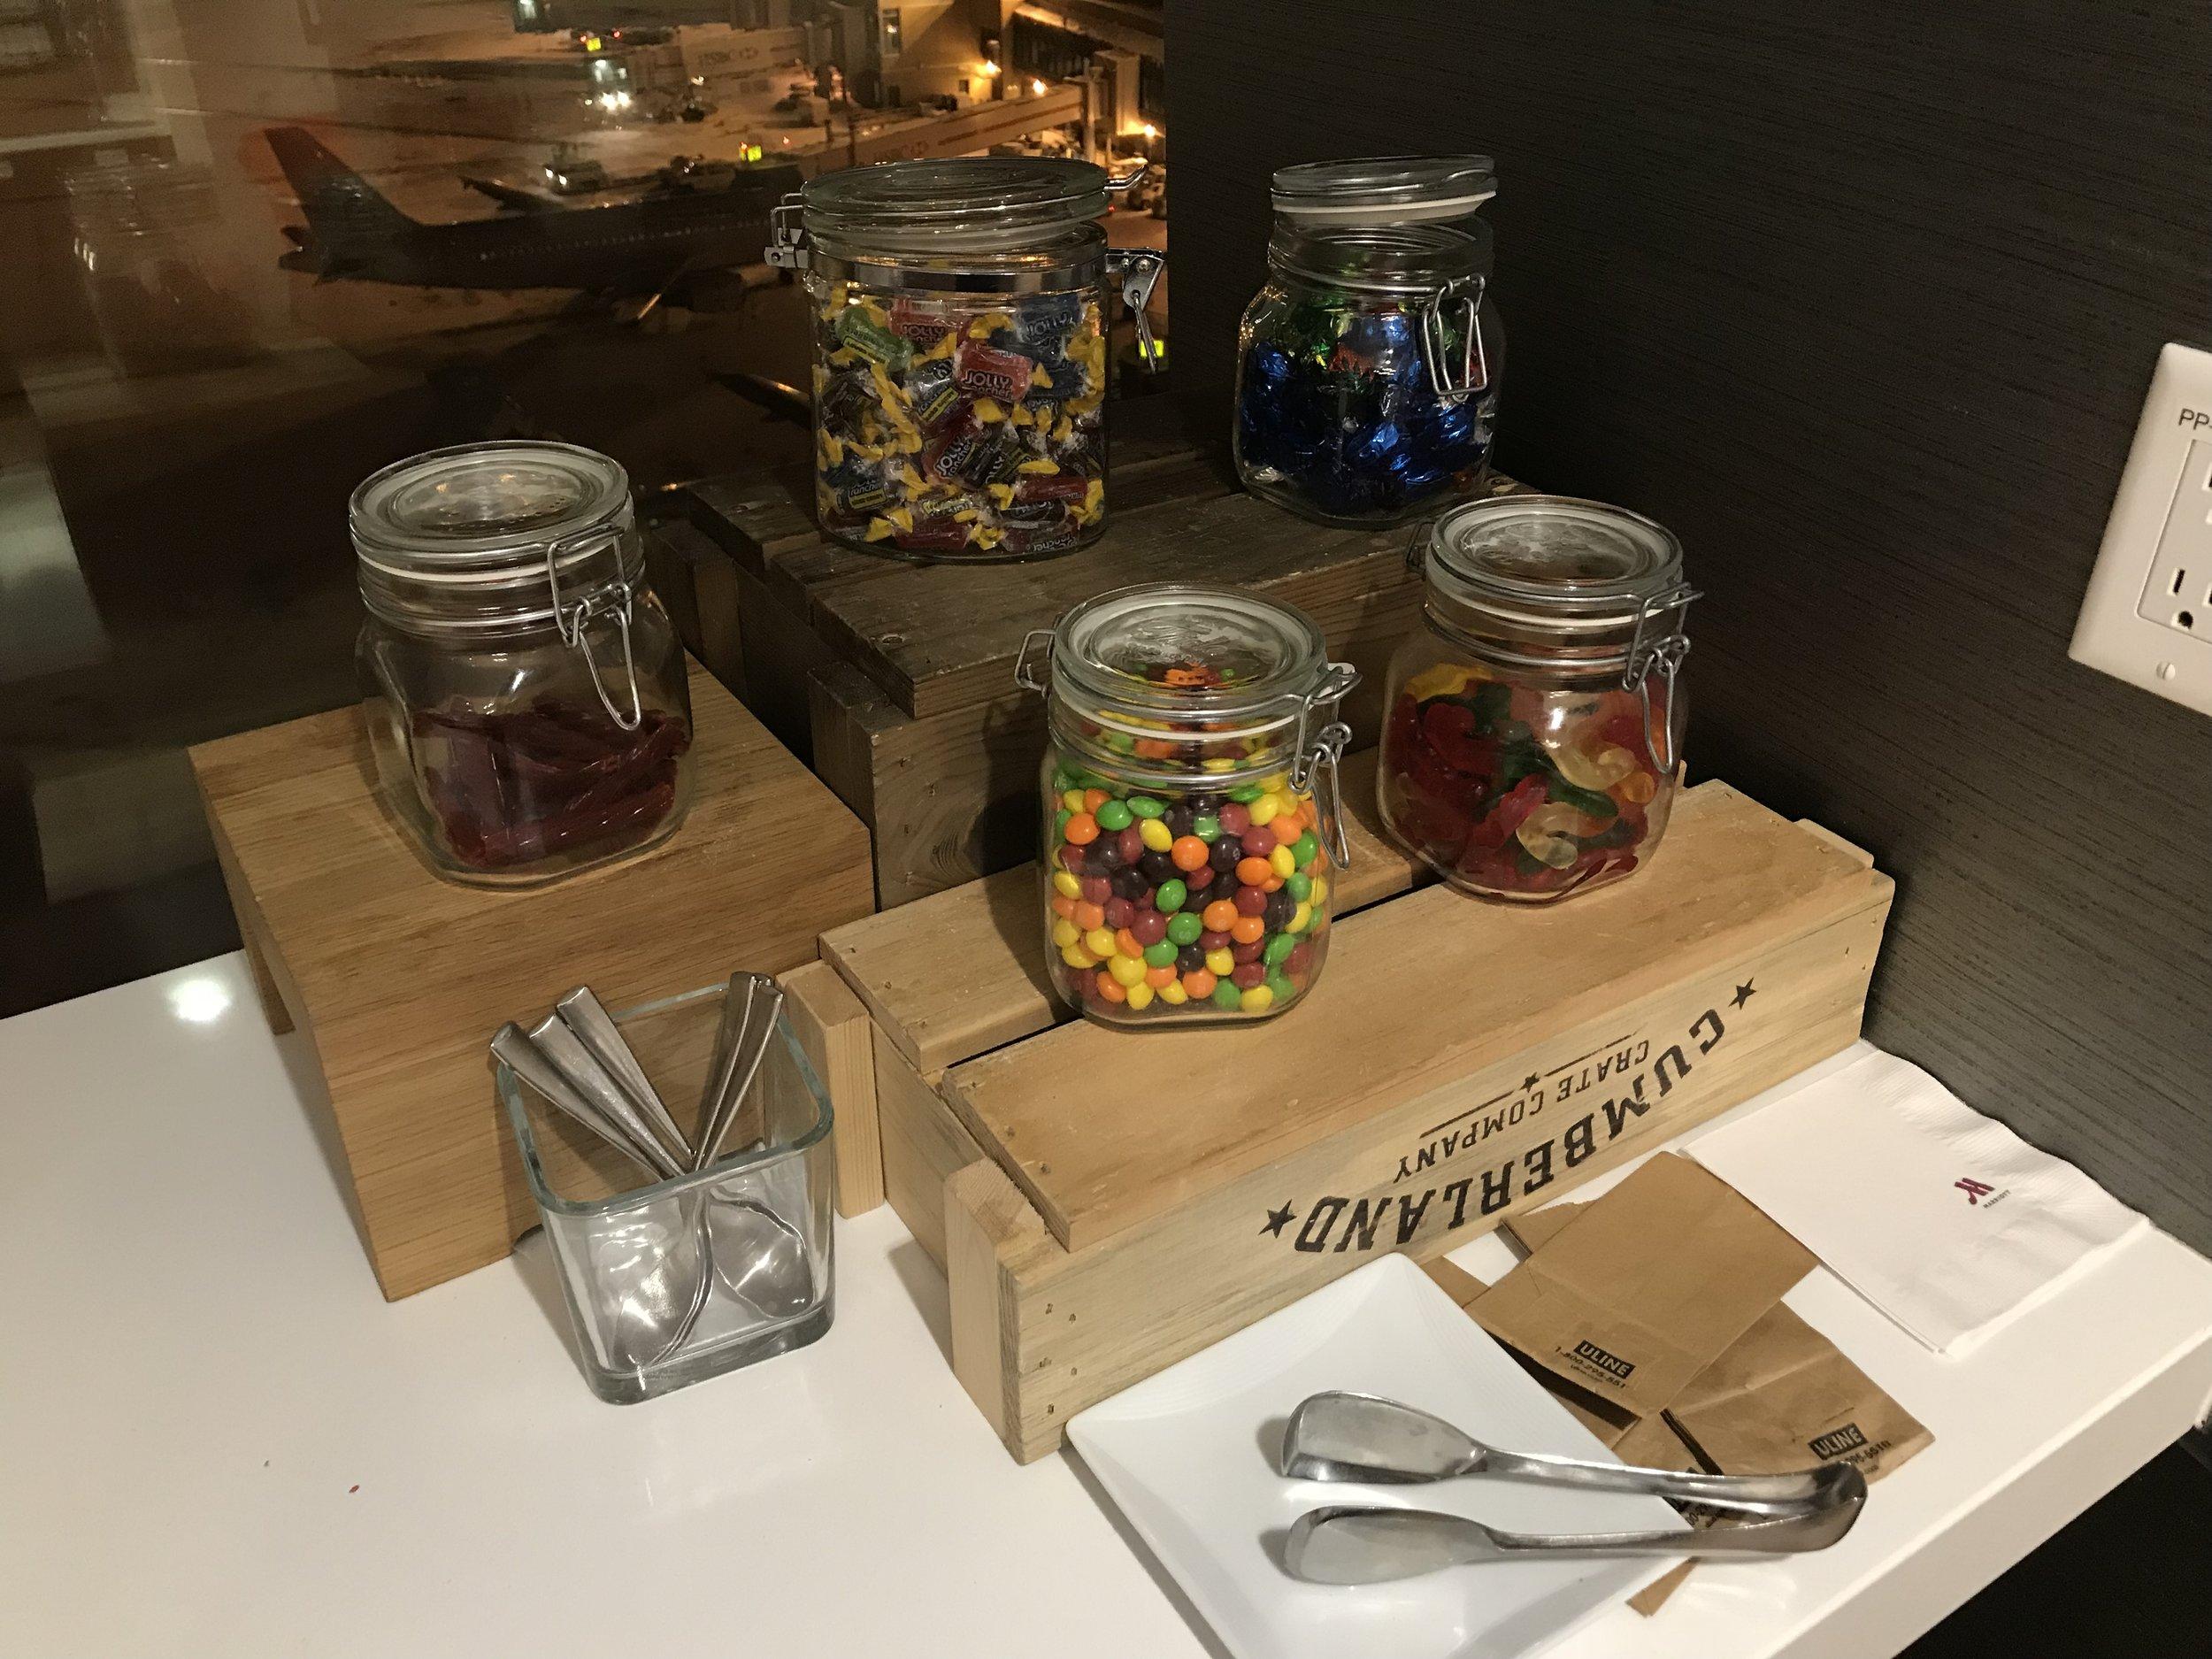 Marriott In-Terminal Hotel Calgary Airport – Snacks